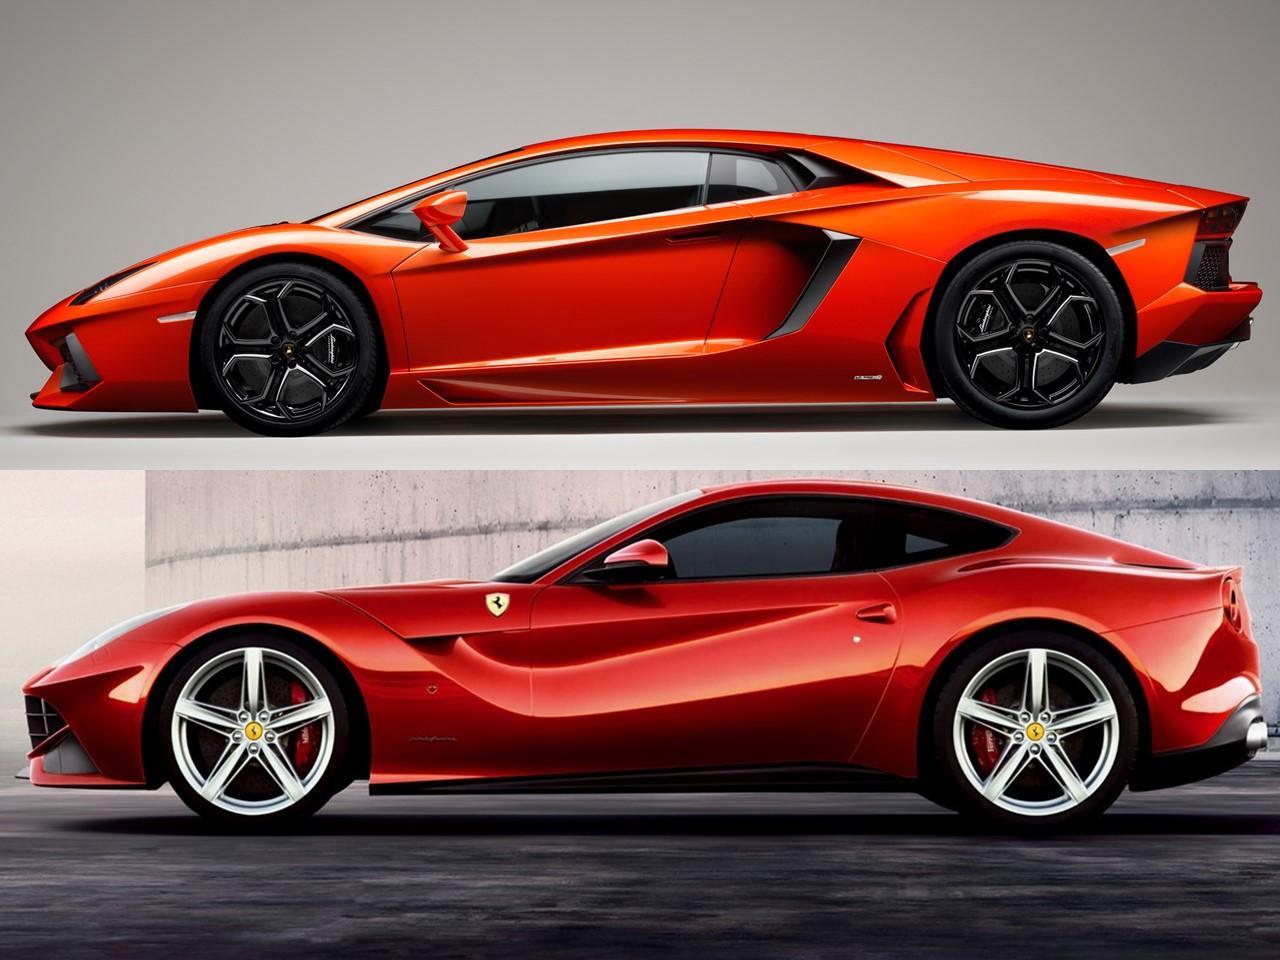 Ferrari F12berlinetta vs Lamborghini Aventador LP 700-4 ...